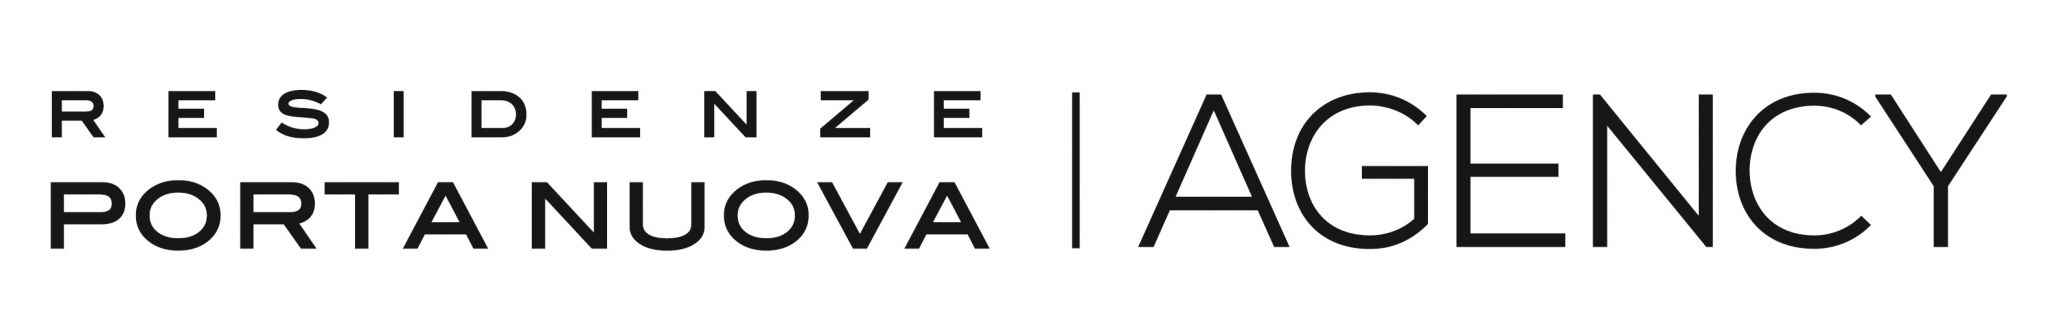 Residenze Porta Nuova Agency